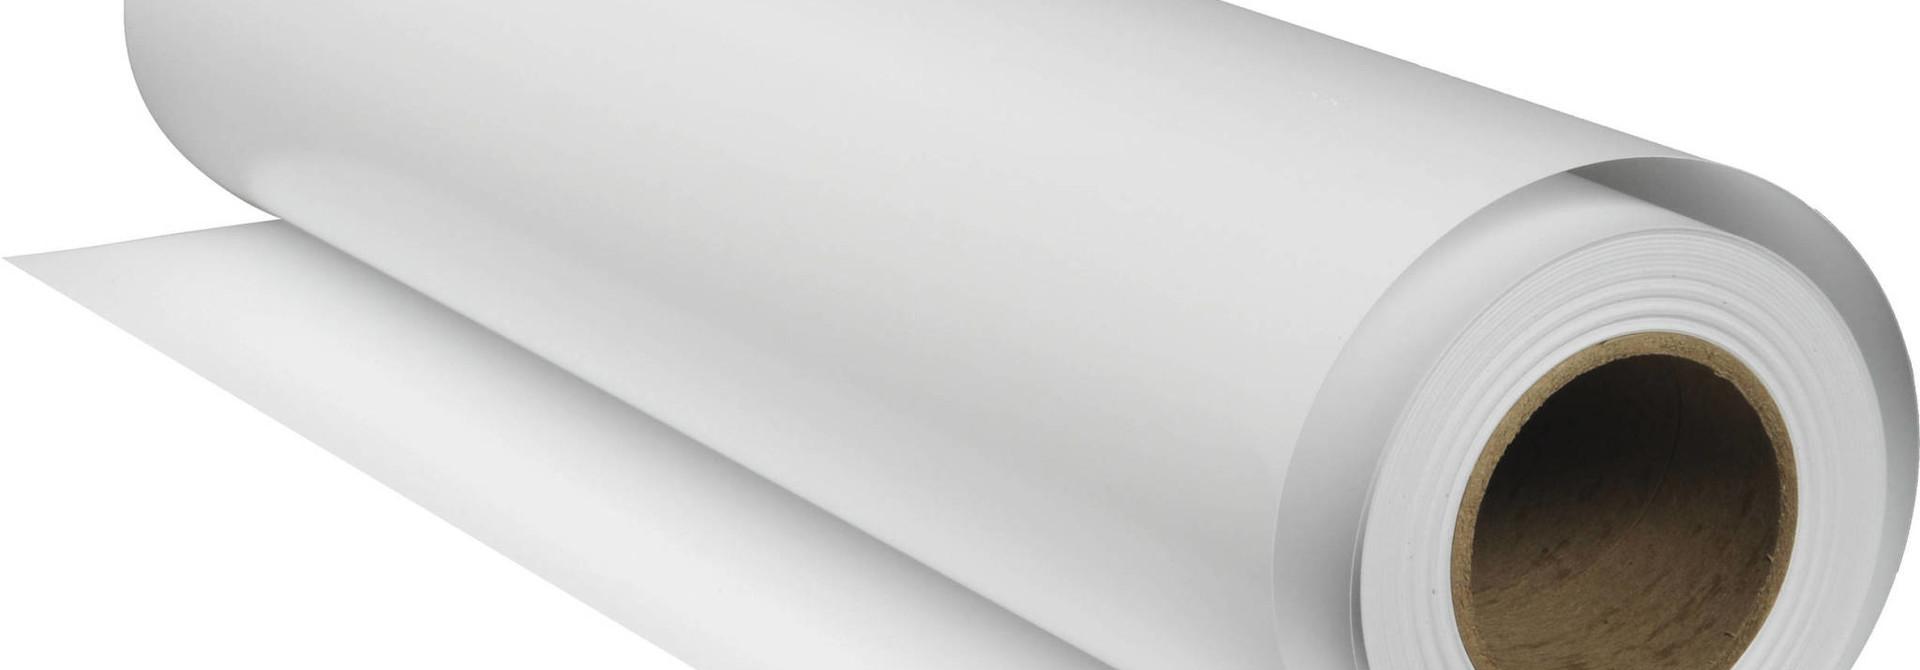 Epson Premium Luster 260 44in Roll per running inch